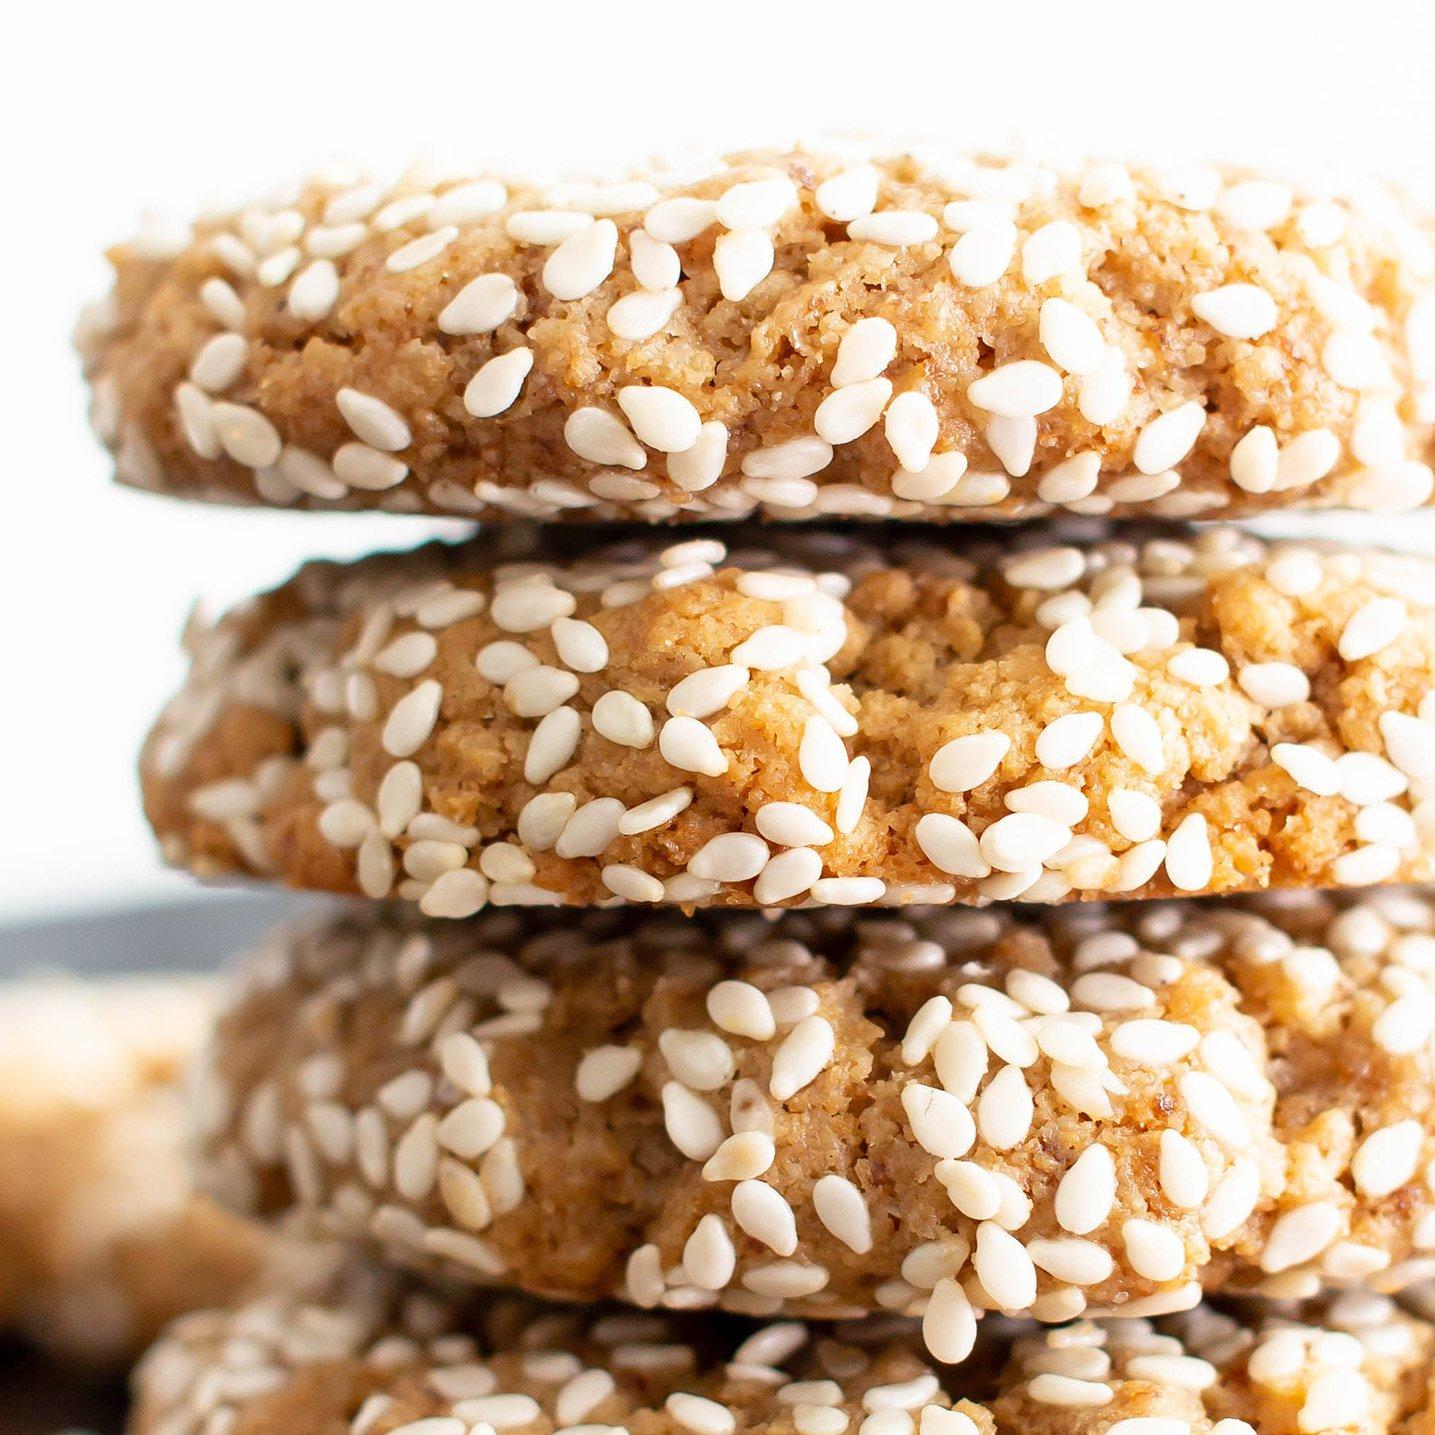 35+ Best Vegan Cookie Recipes: amazingly tasty vegan cookies everyone will love! Including vegan chocolate chip cookies, vegan peanut butter cookies, vegan oatmeal cookies and more! #Vegan #VeganCookie #VeganChocolateChipCookies #VeganDesserts | Recipes at BeamingBaker.com